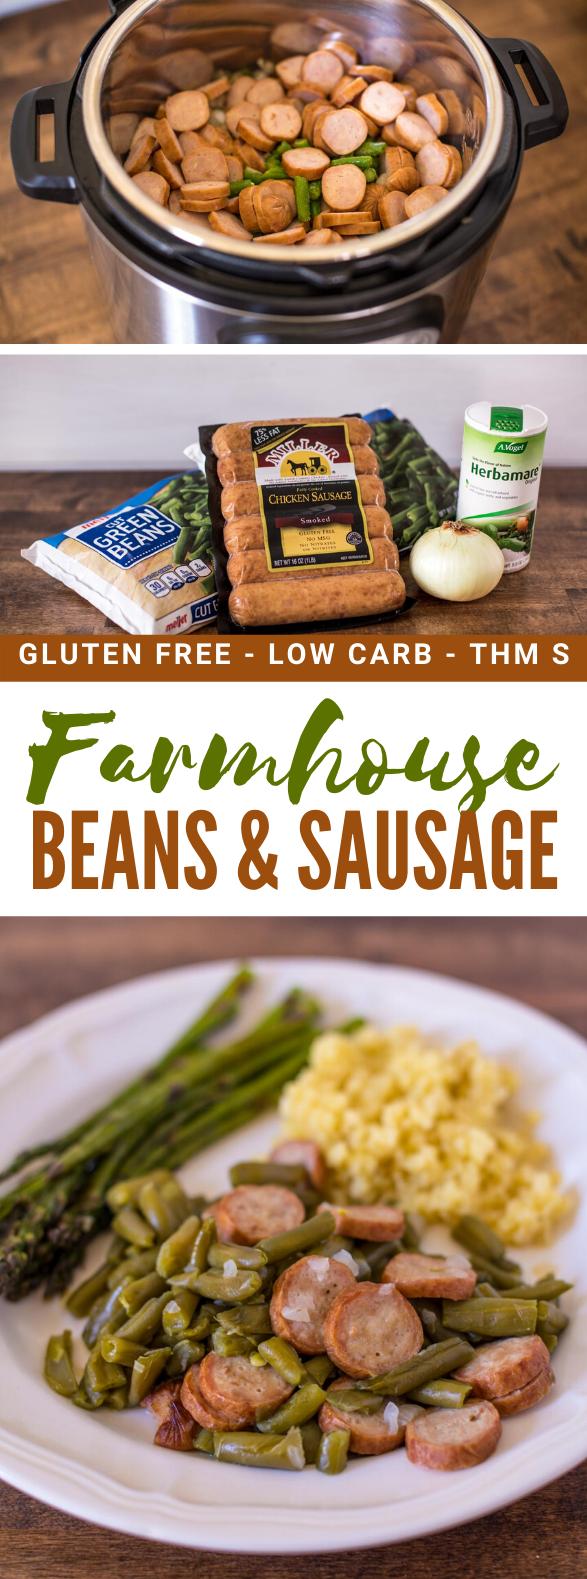 Farmhouse Beans & Sausage (Gluten-Free) #lowcarb #thms